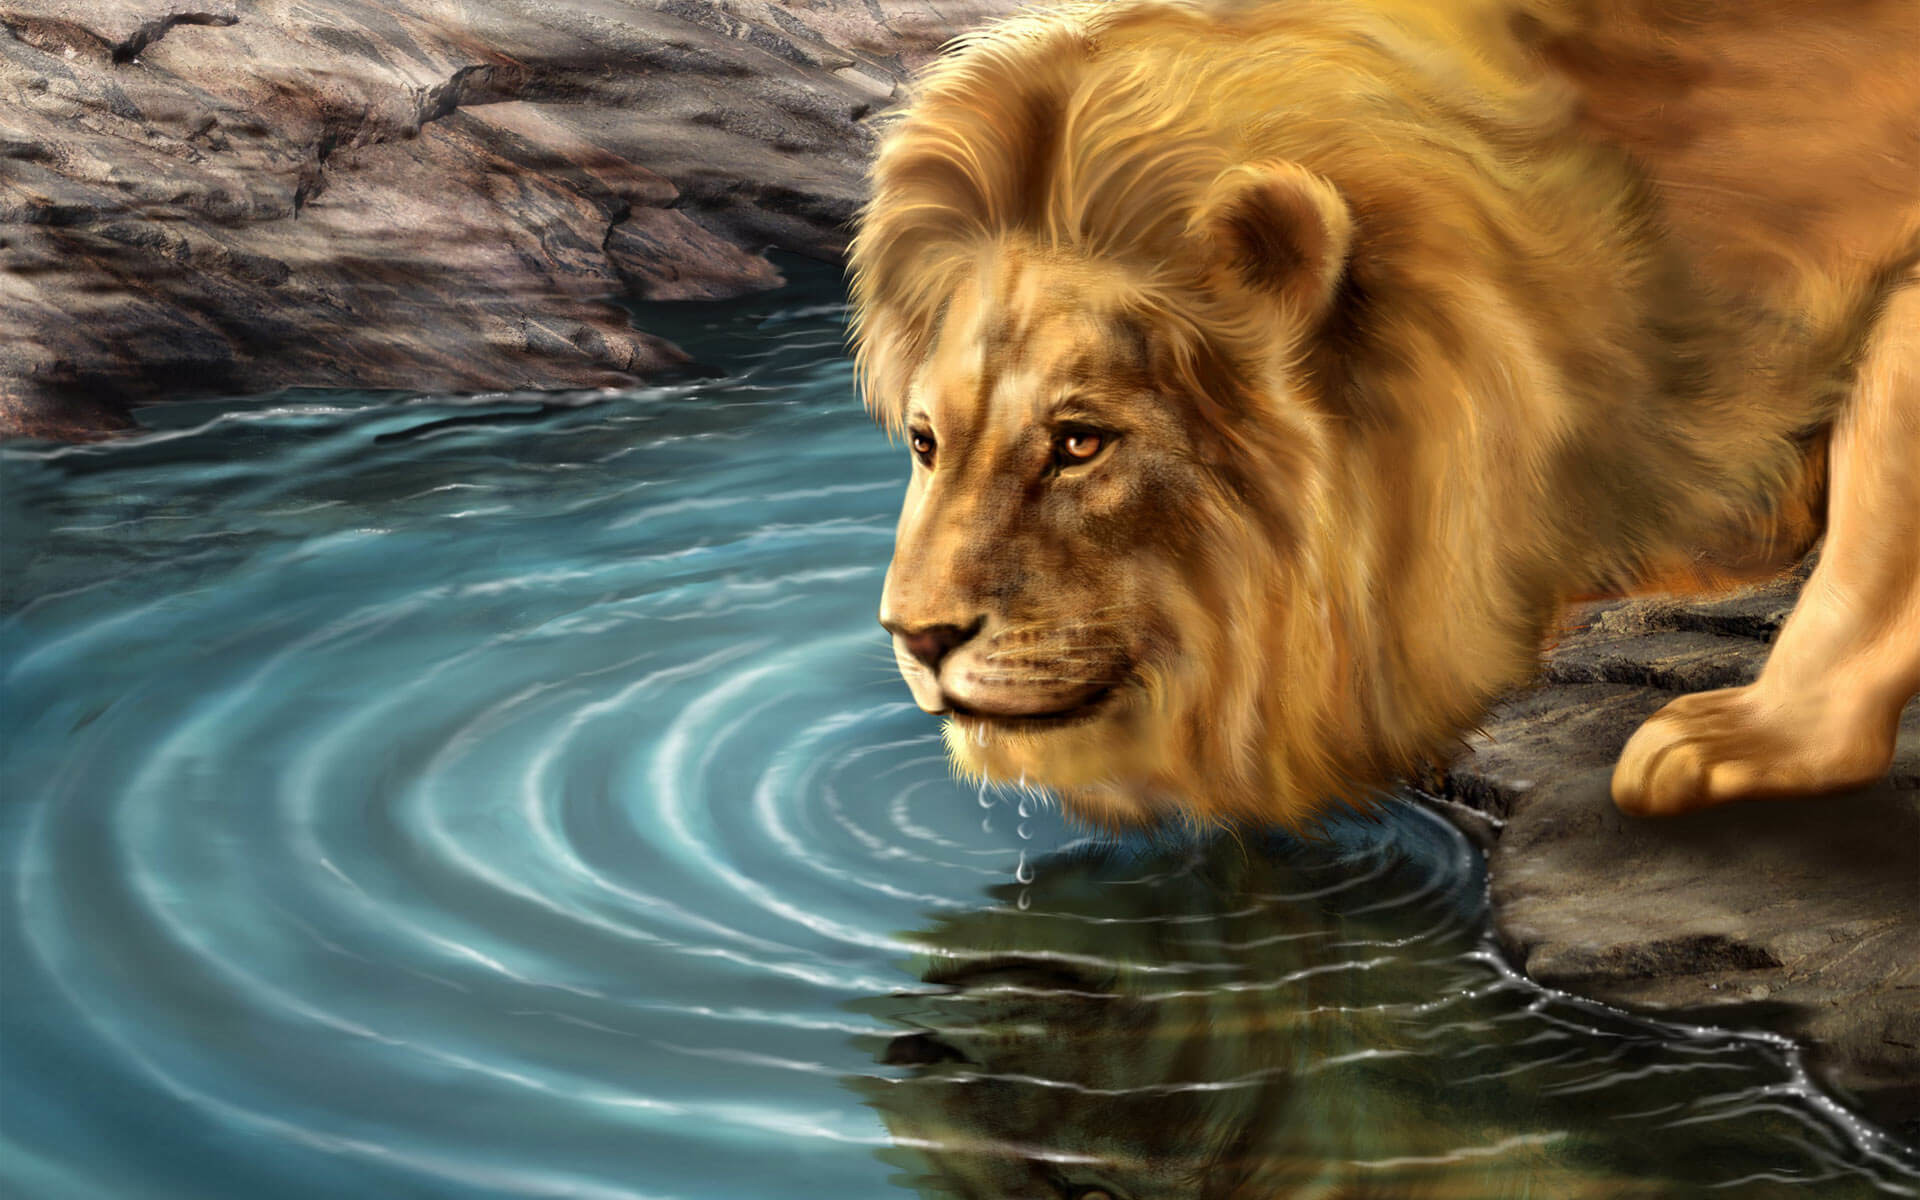 Colorful Lion Wallpaper (57+ Images